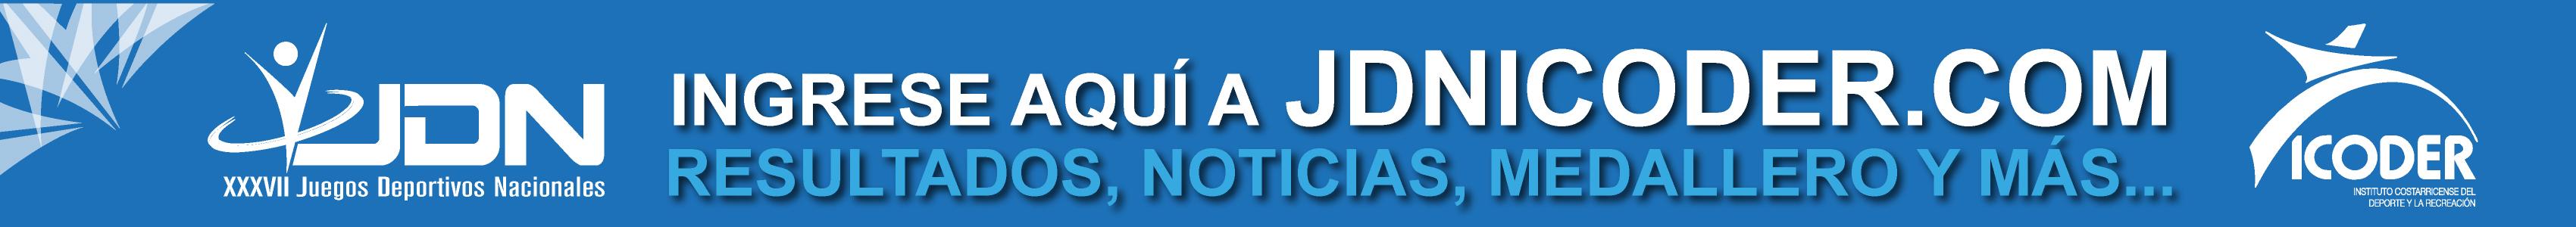 Banner JDN 2018